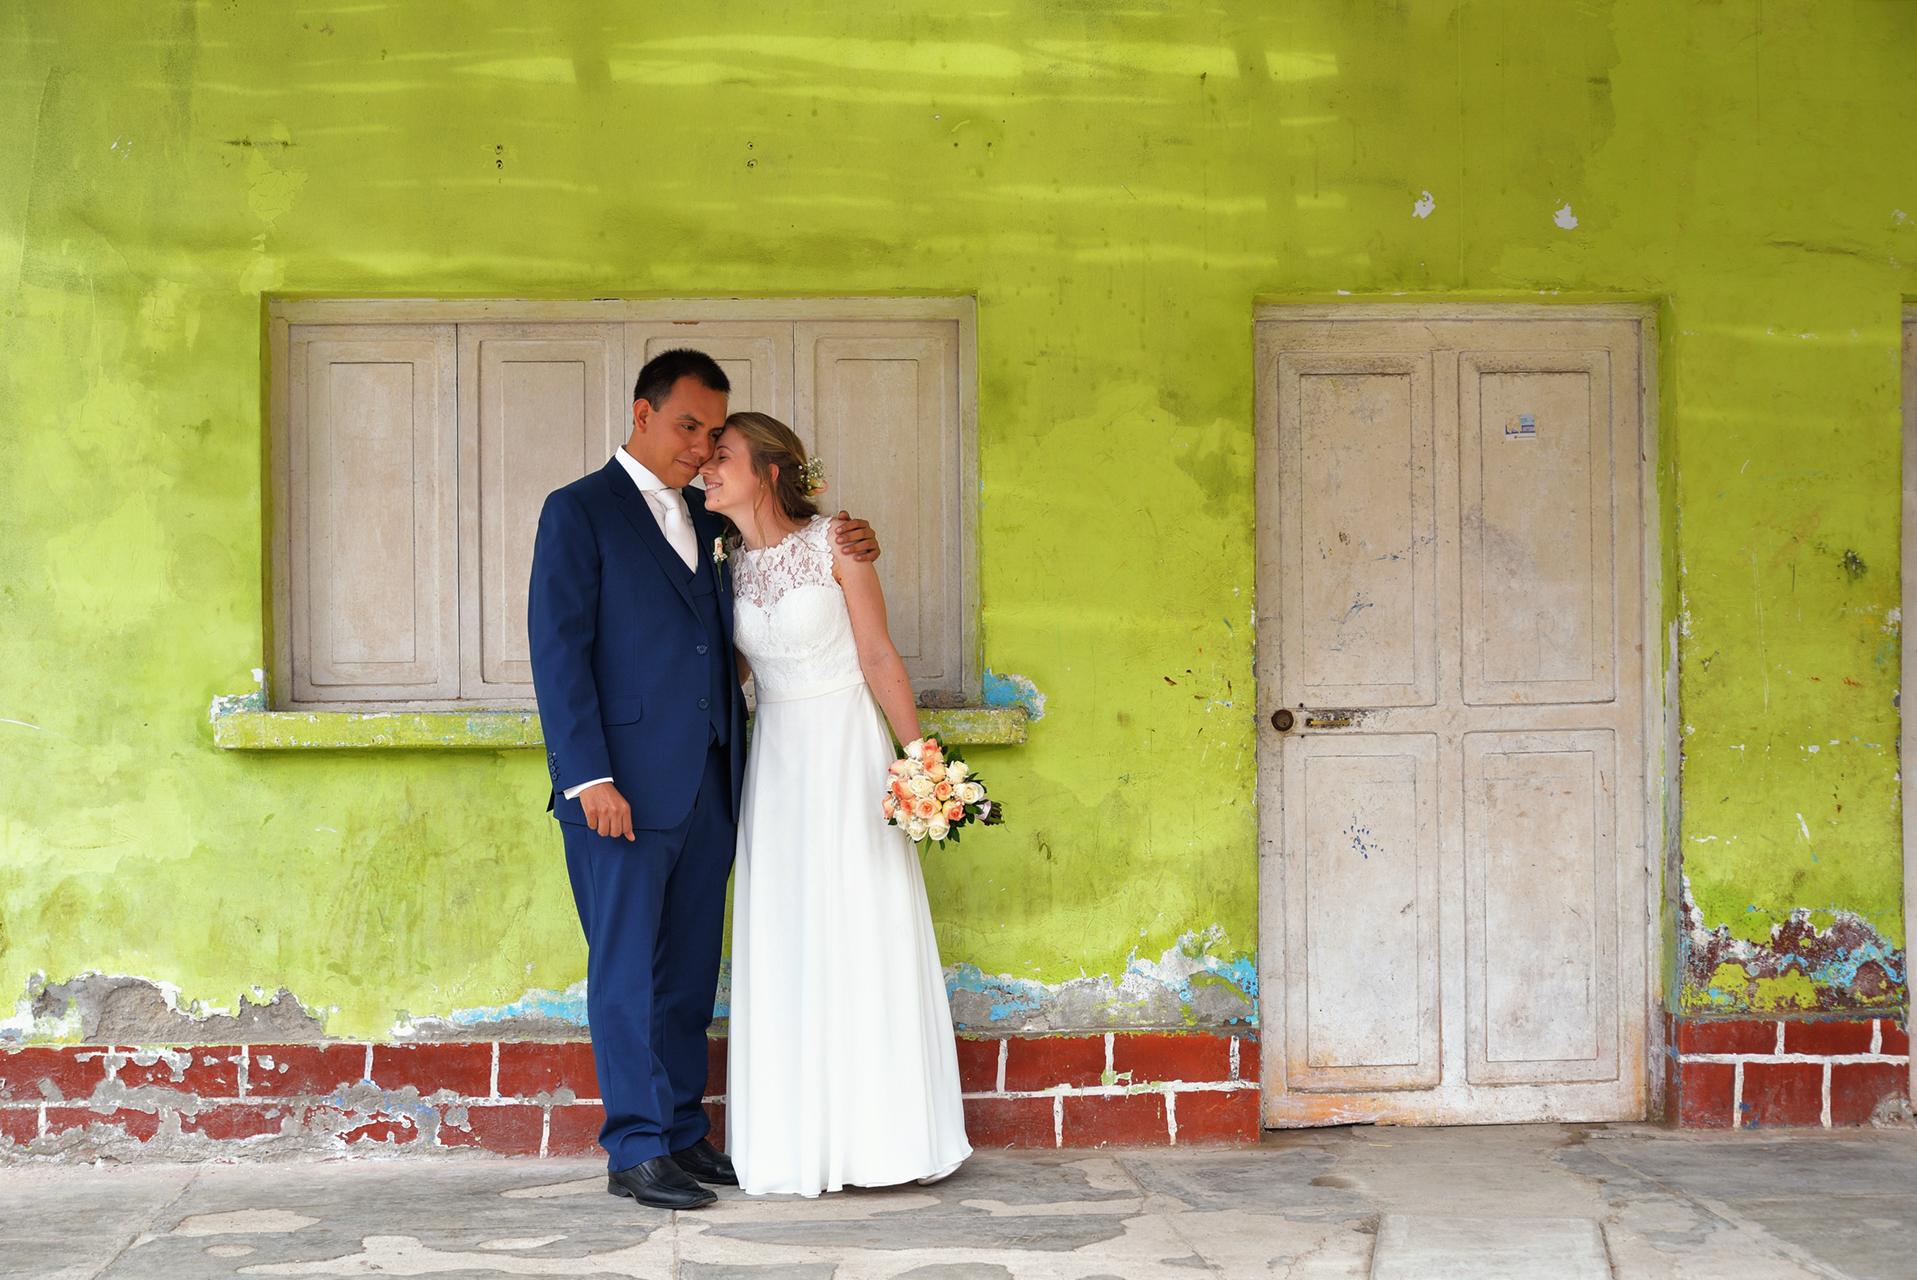 Bruidspaar in Zuid-Amerika. De fotograaf uit Nederland is meegereisd.